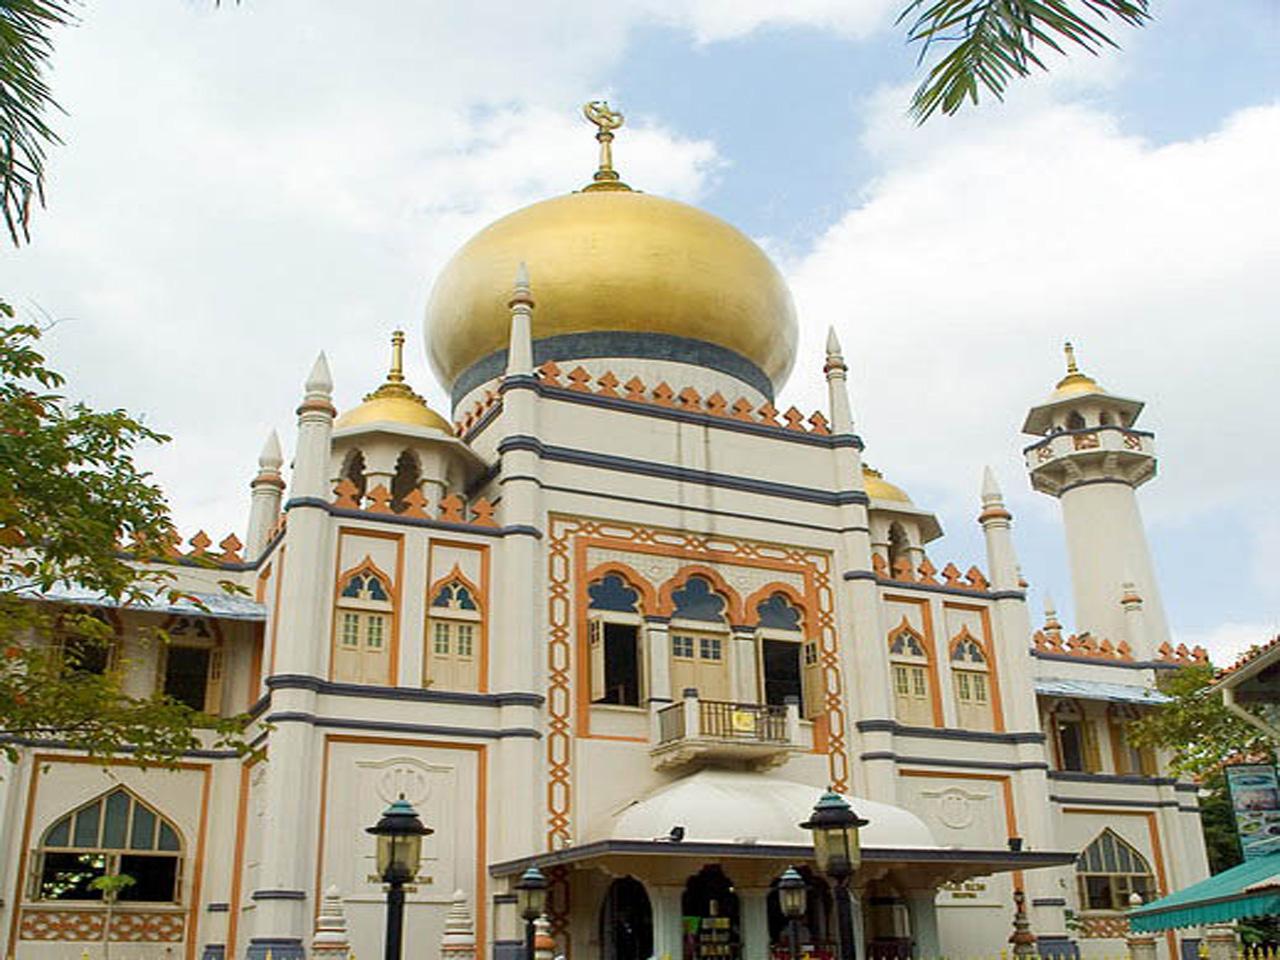 Mosque: NIm 2011: World's Most Beautiful Mosque Part 6